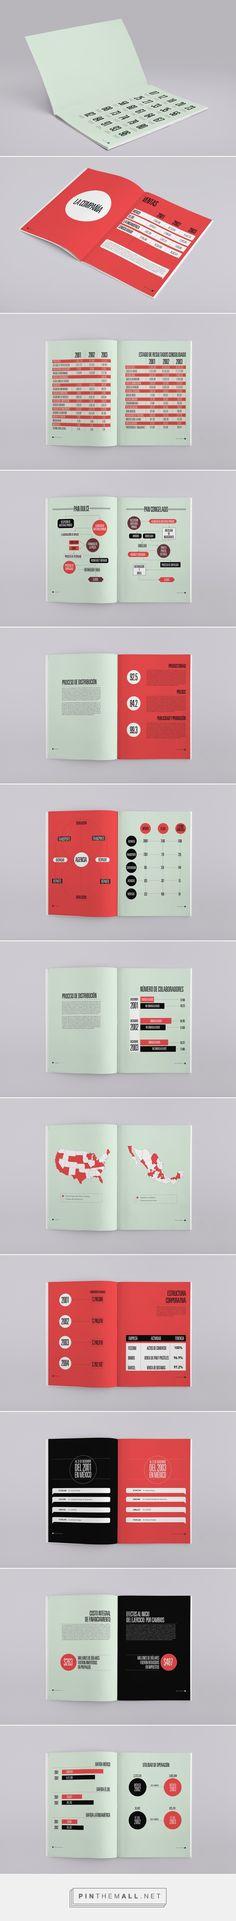 Annual report for Bimbo. Book Design, Layout Design, Print Design, Graphic Design, Design Editorial, Editorial Layout, Layout Book, Annual Reports, Info Graphics